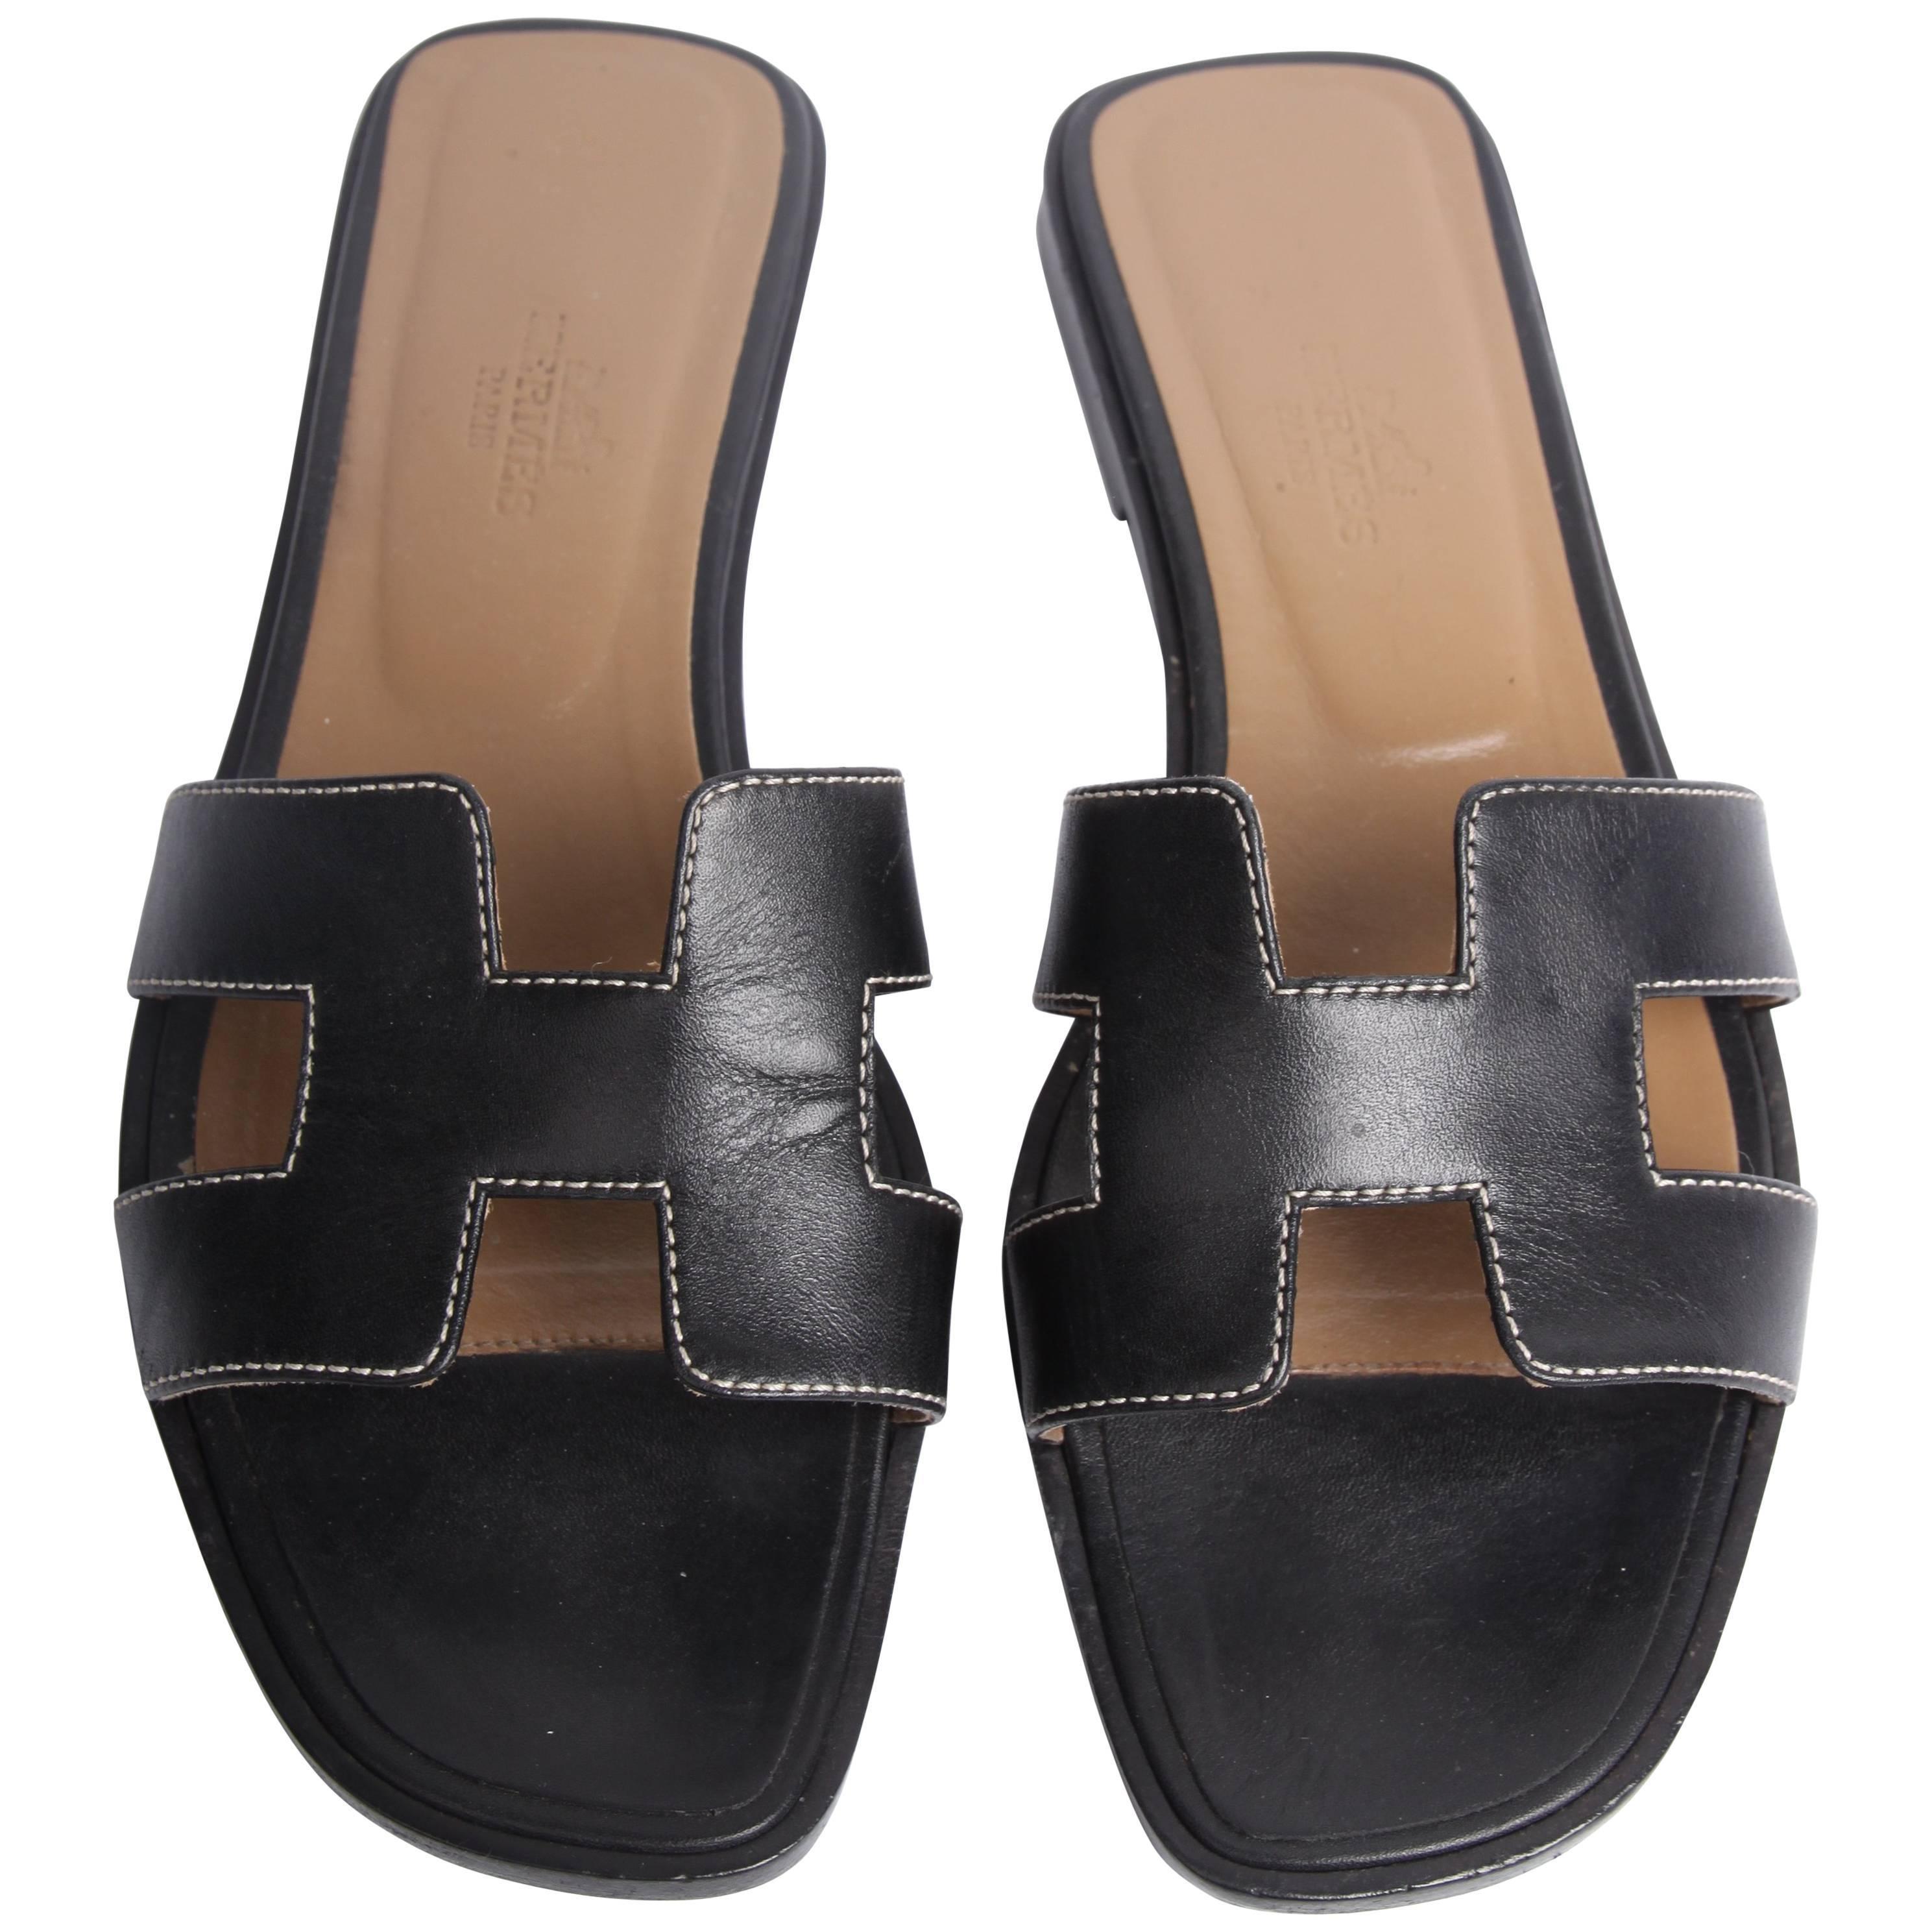 82e4b7e85ba51 Hermes Flat Sandals - black at 1stdibs